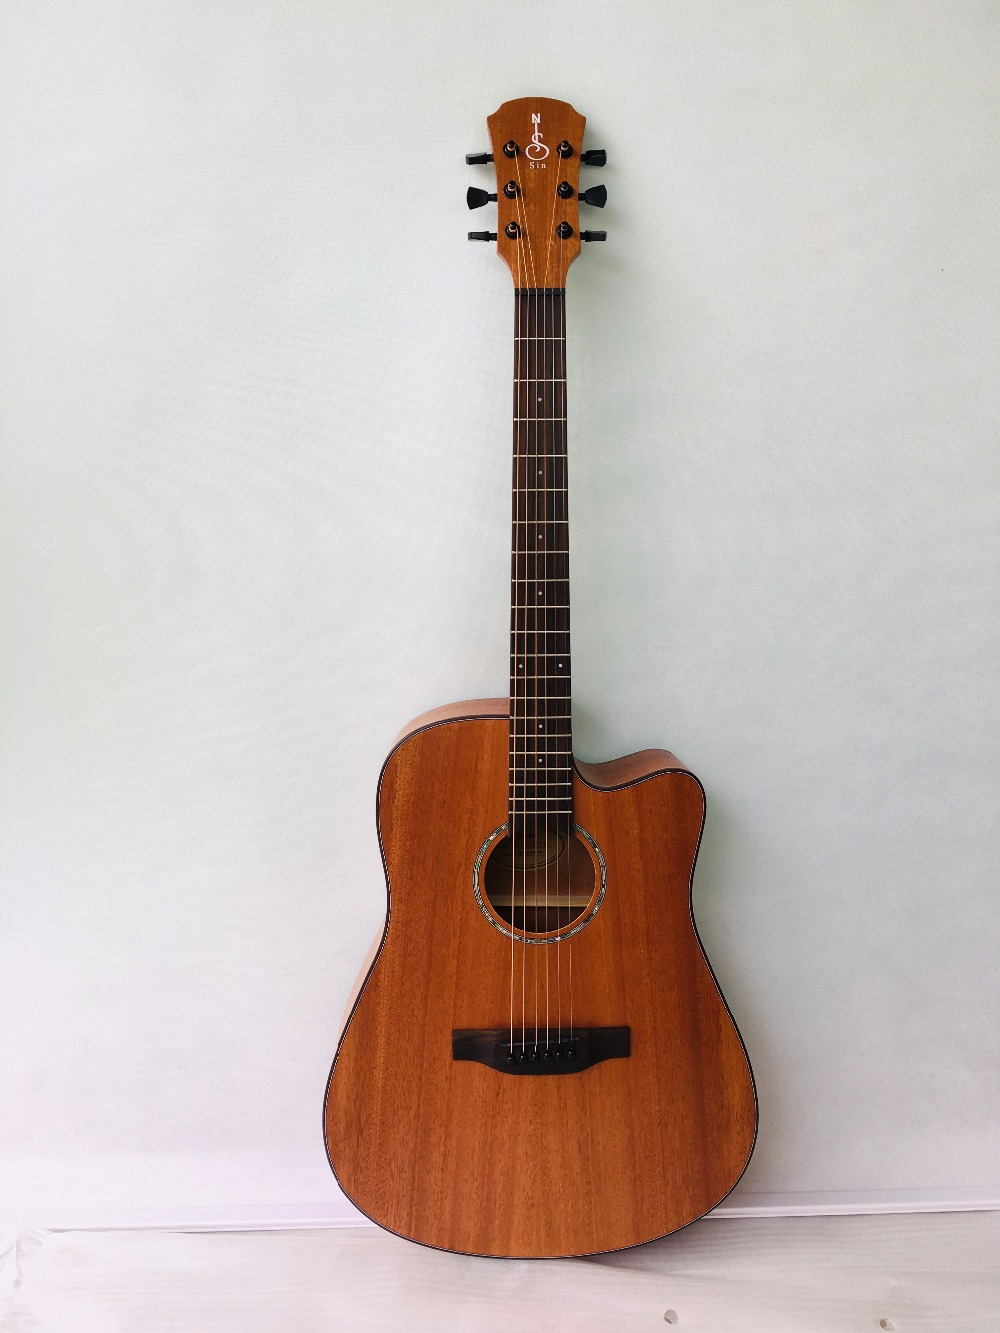 41 Inch Acoustic Guitar Beginner Practice Folk Guitar 6 Strings Mahogany Music Instrument for Student Lovers Gift